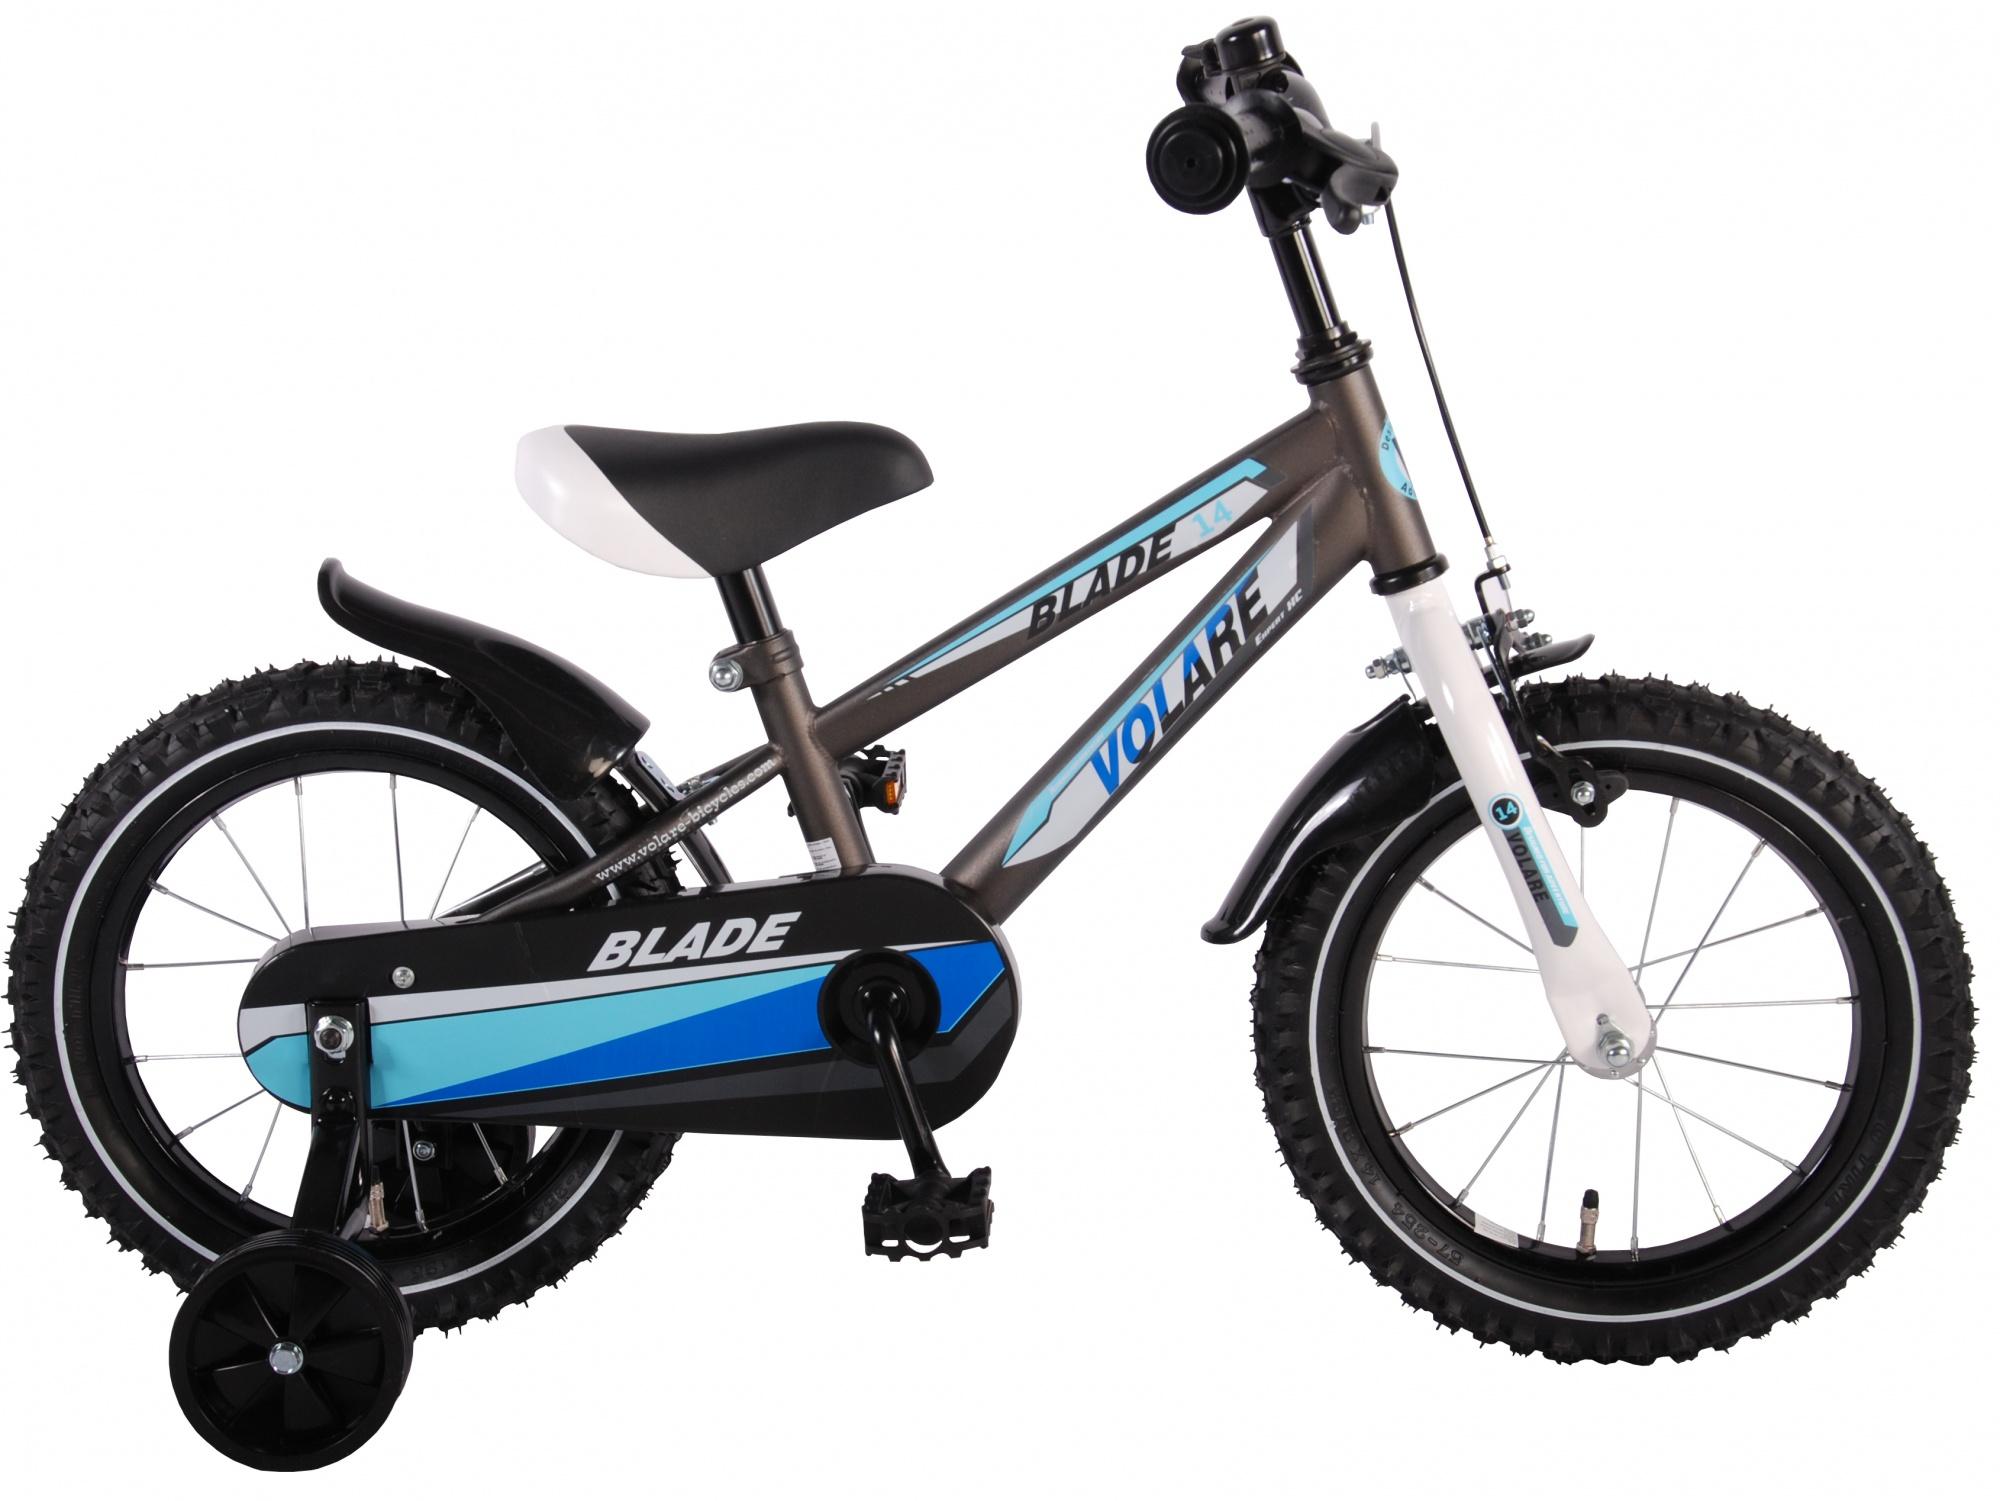 volare blade 14 zoll 23 5 cm jungen r cktrittbremse silber internet bikes. Black Bedroom Furniture Sets. Home Design Ideas